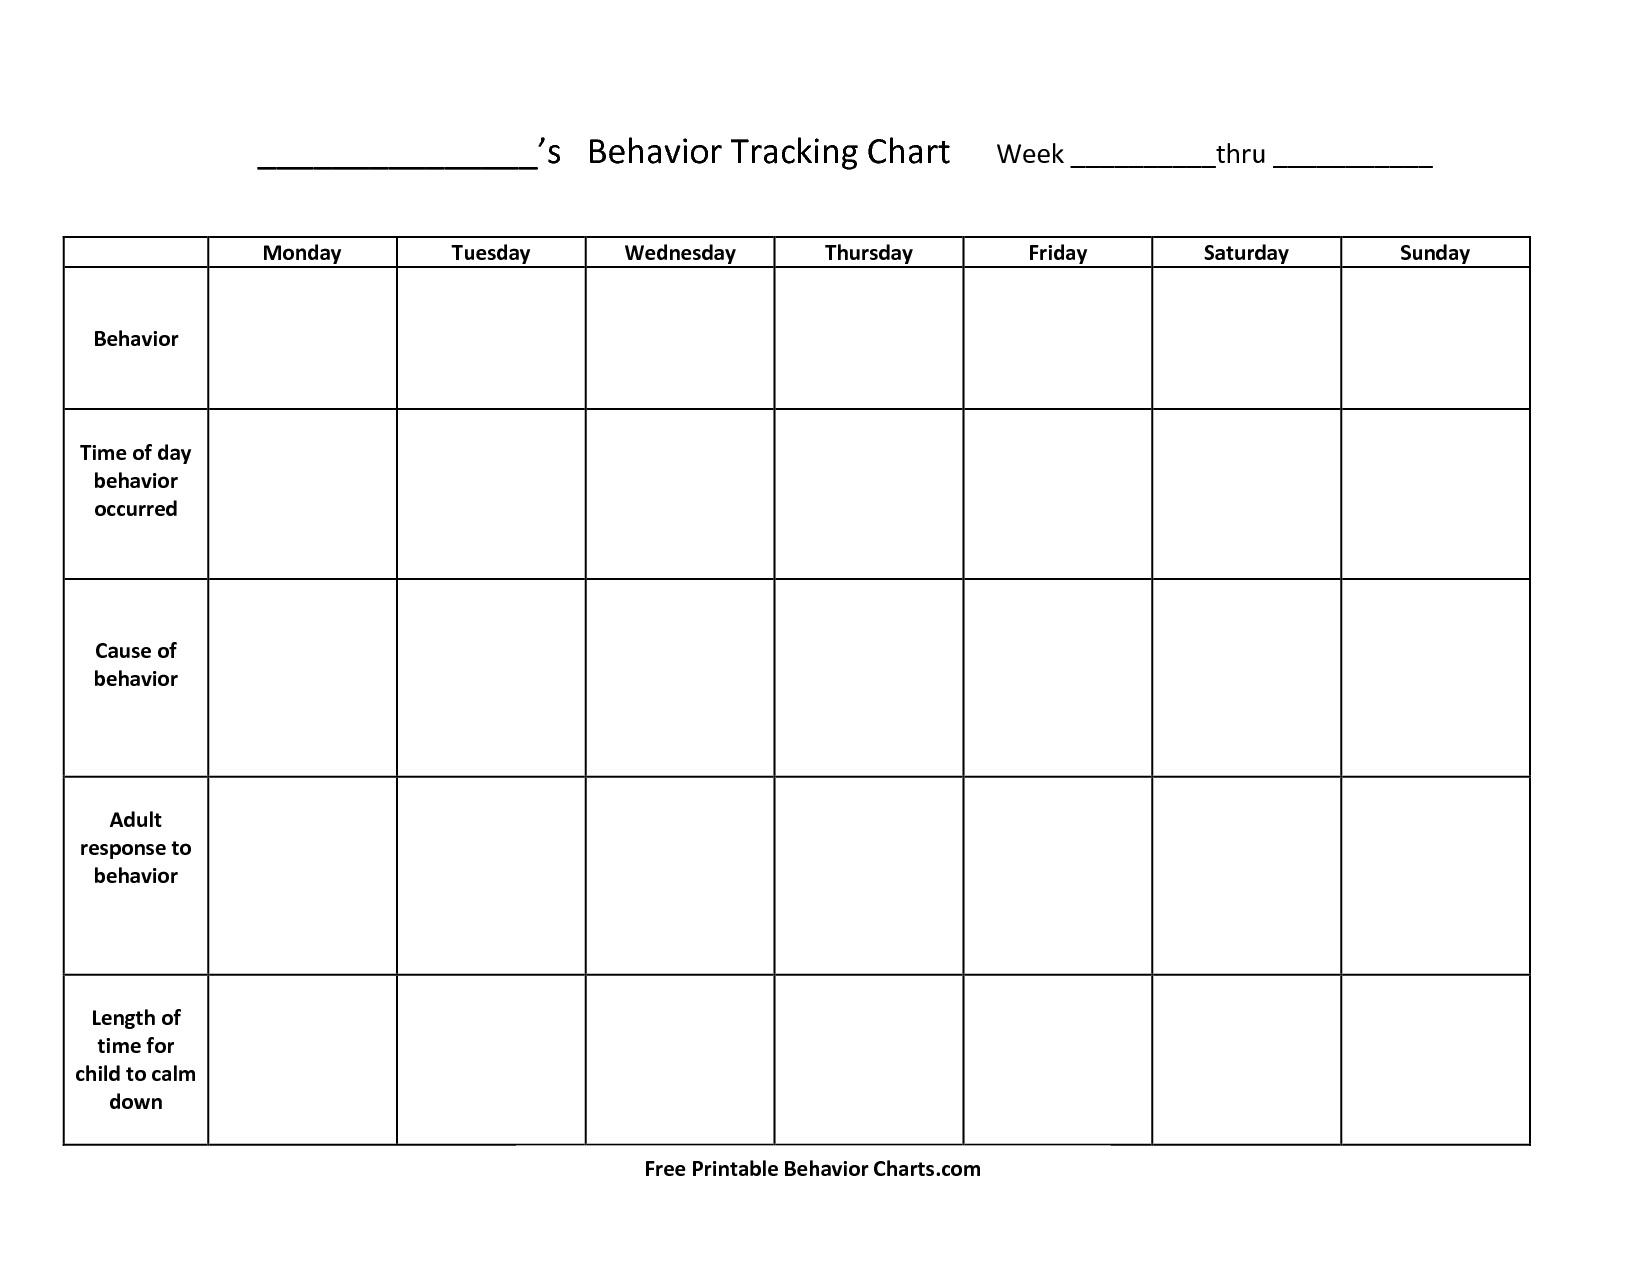 Printable Behavior Charts For Teachers | Room Surf - Free Printable Reward Charts For Teenagers